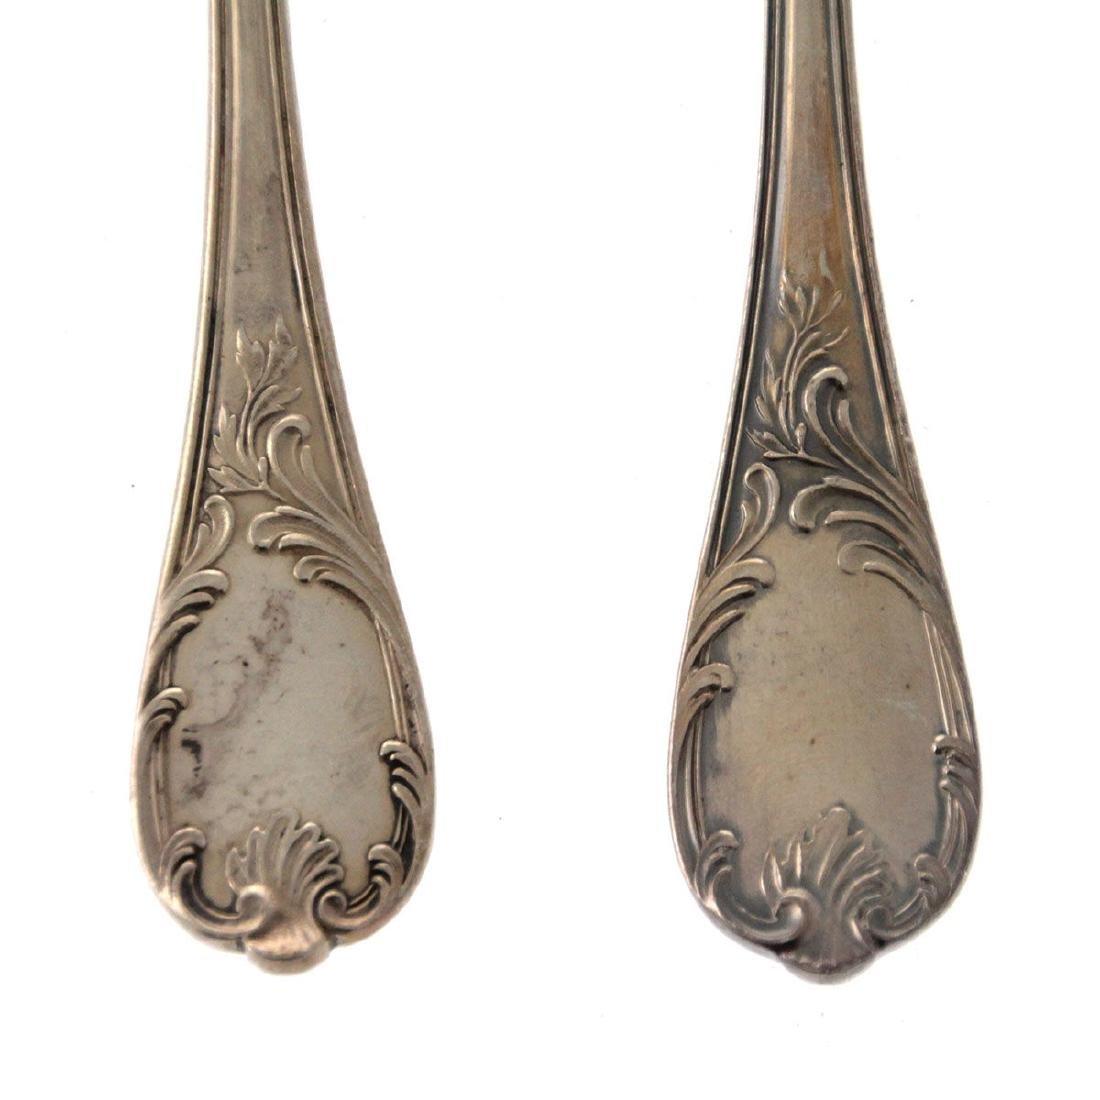 Christofle 65pcs Silver Plated Flatware Cutlery Set, - 3